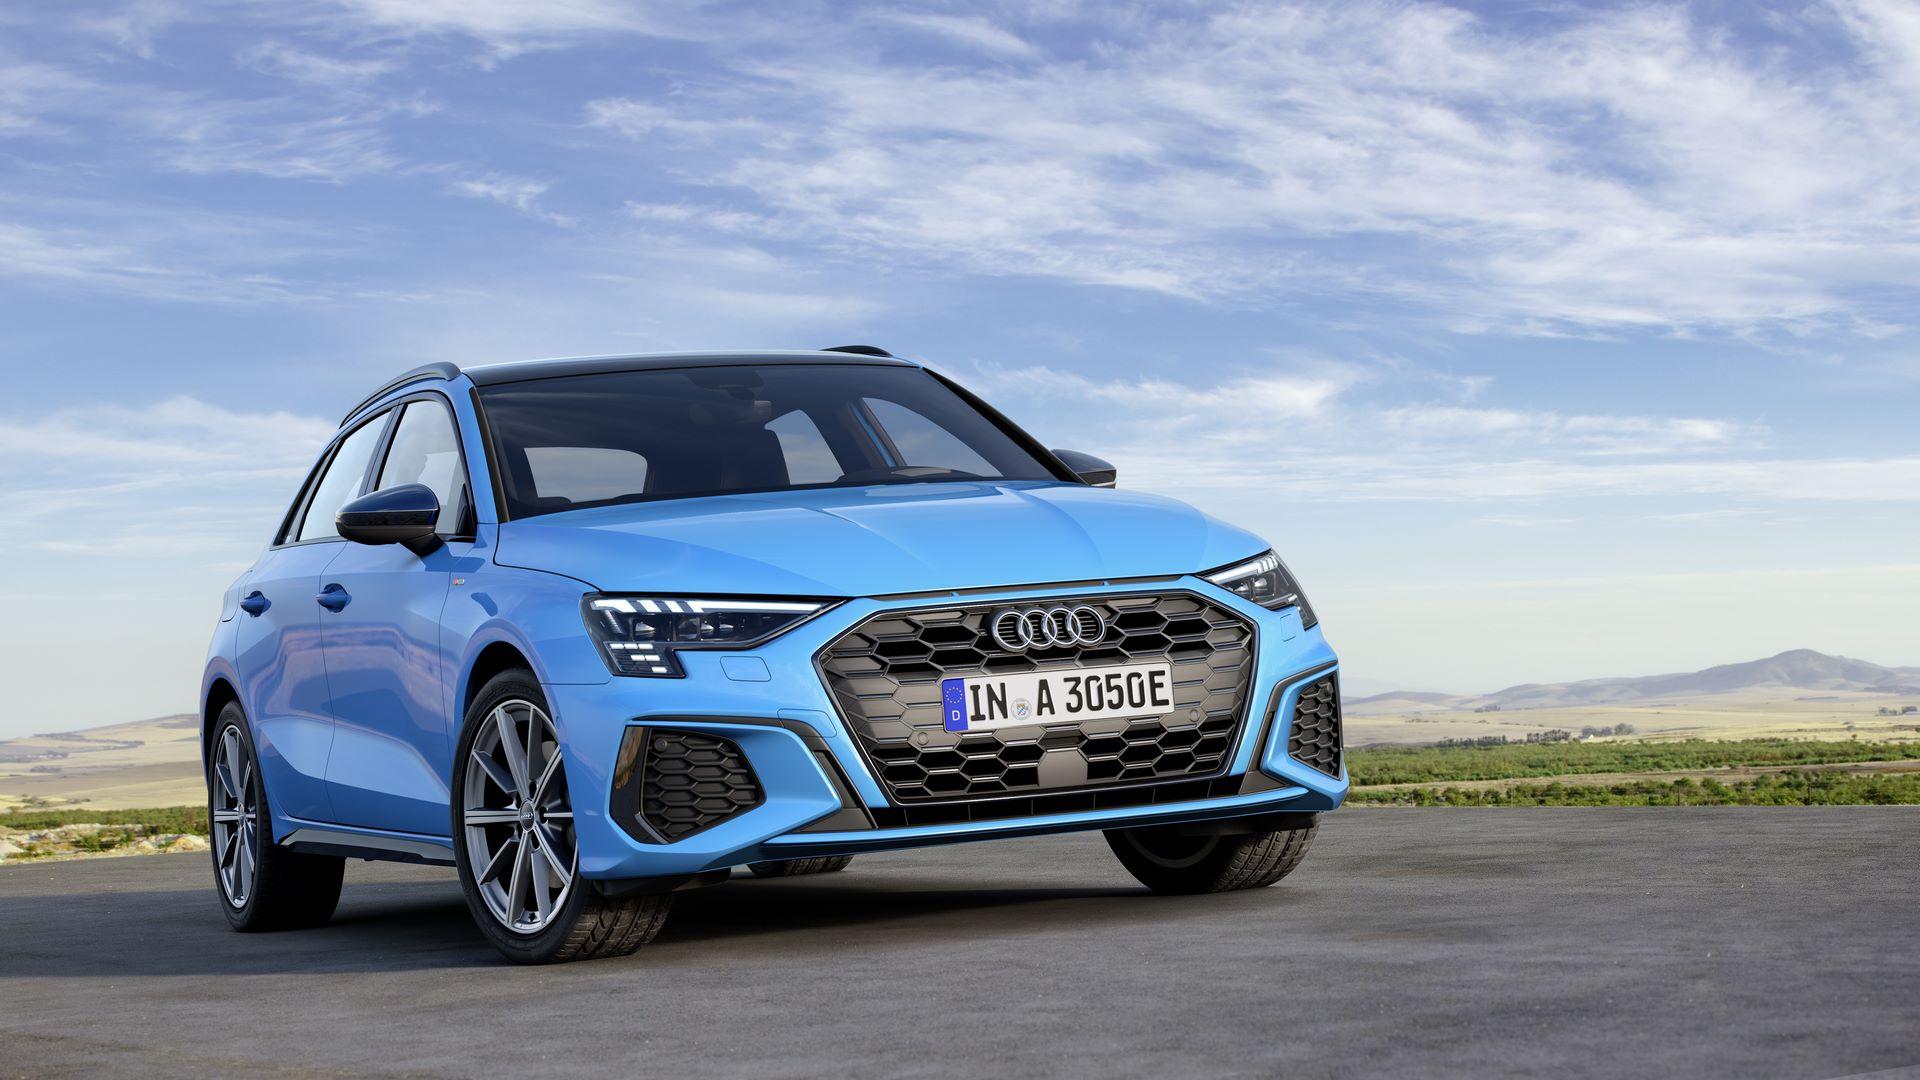 Audi A3 Sportback 40 TFSI e (2021)